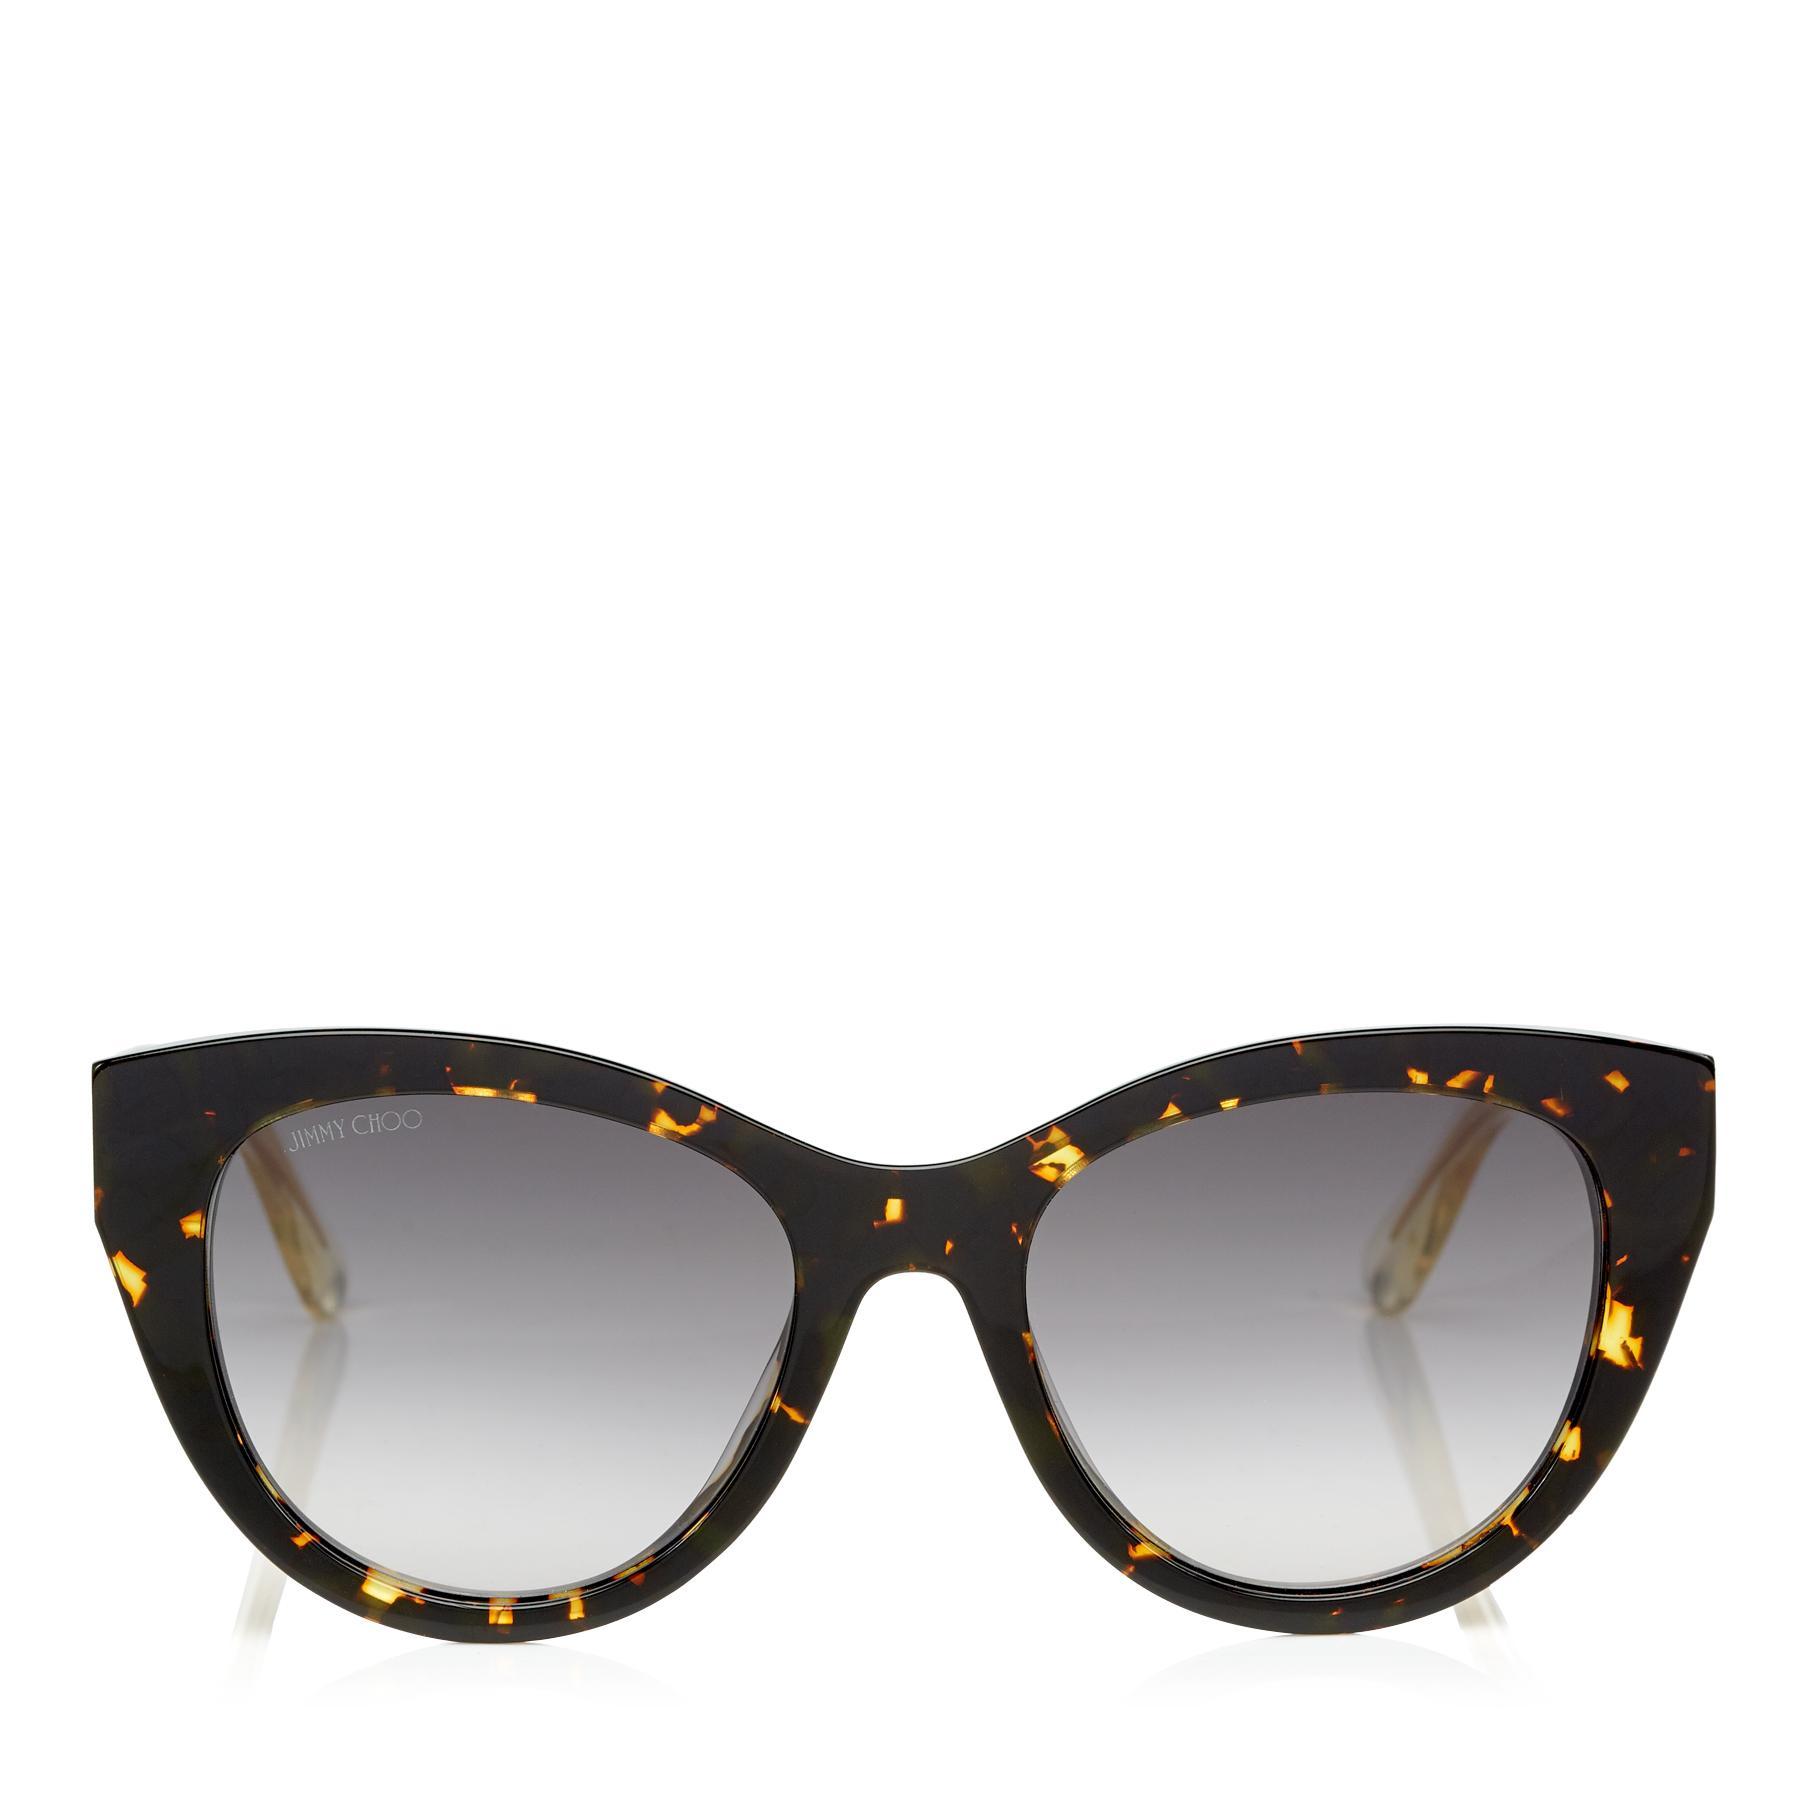 47593ba3216b Jimmy Choo - Gray Chahna Havana Acetate Cat-eye Sunglasses With Rose Gold  Chain Metal. View fullscreen